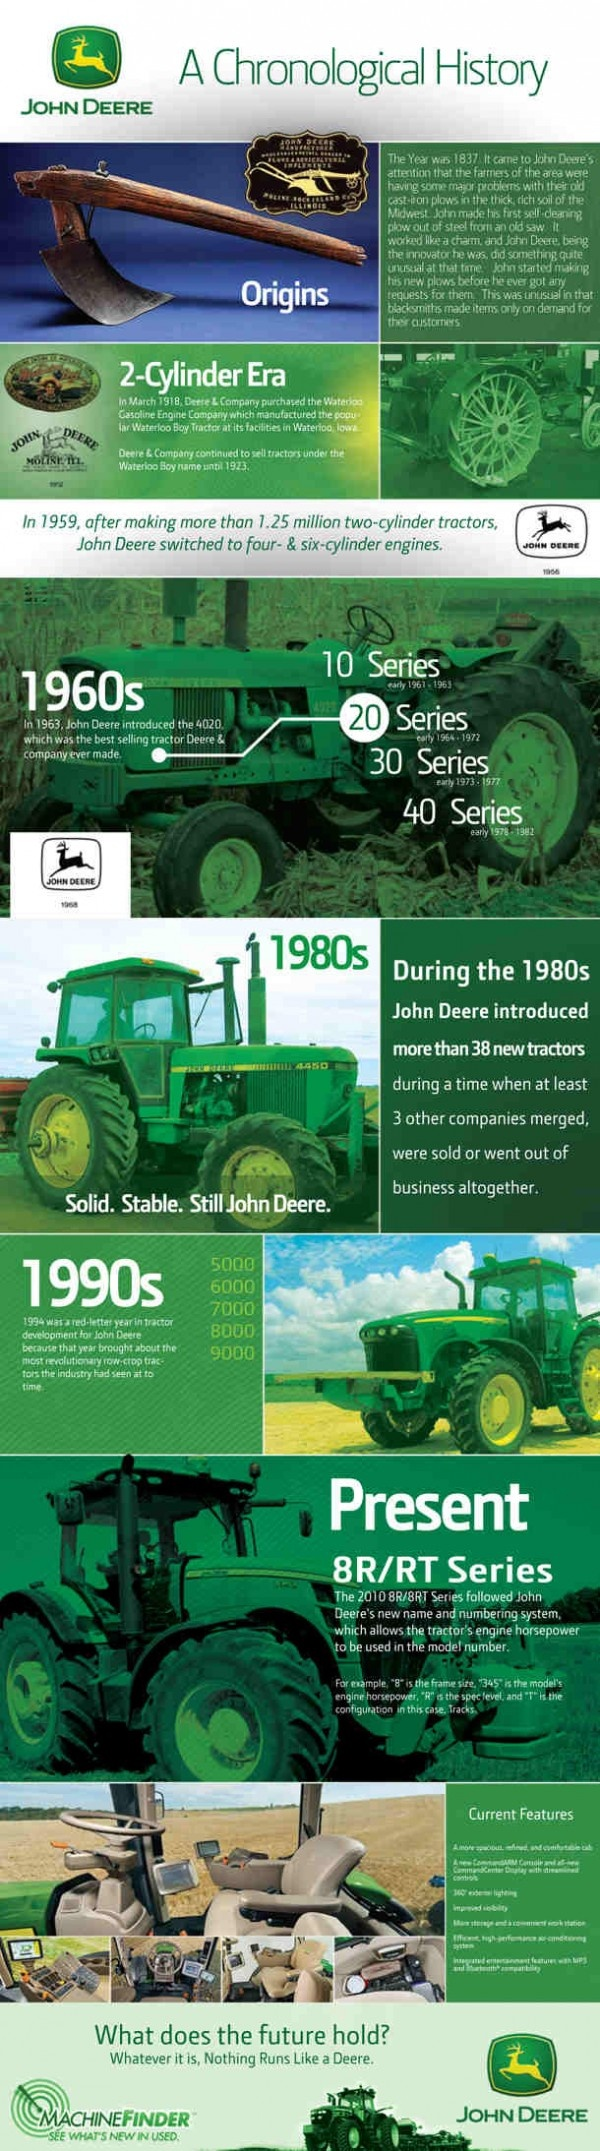 John Deere Infographic: A Chronological History